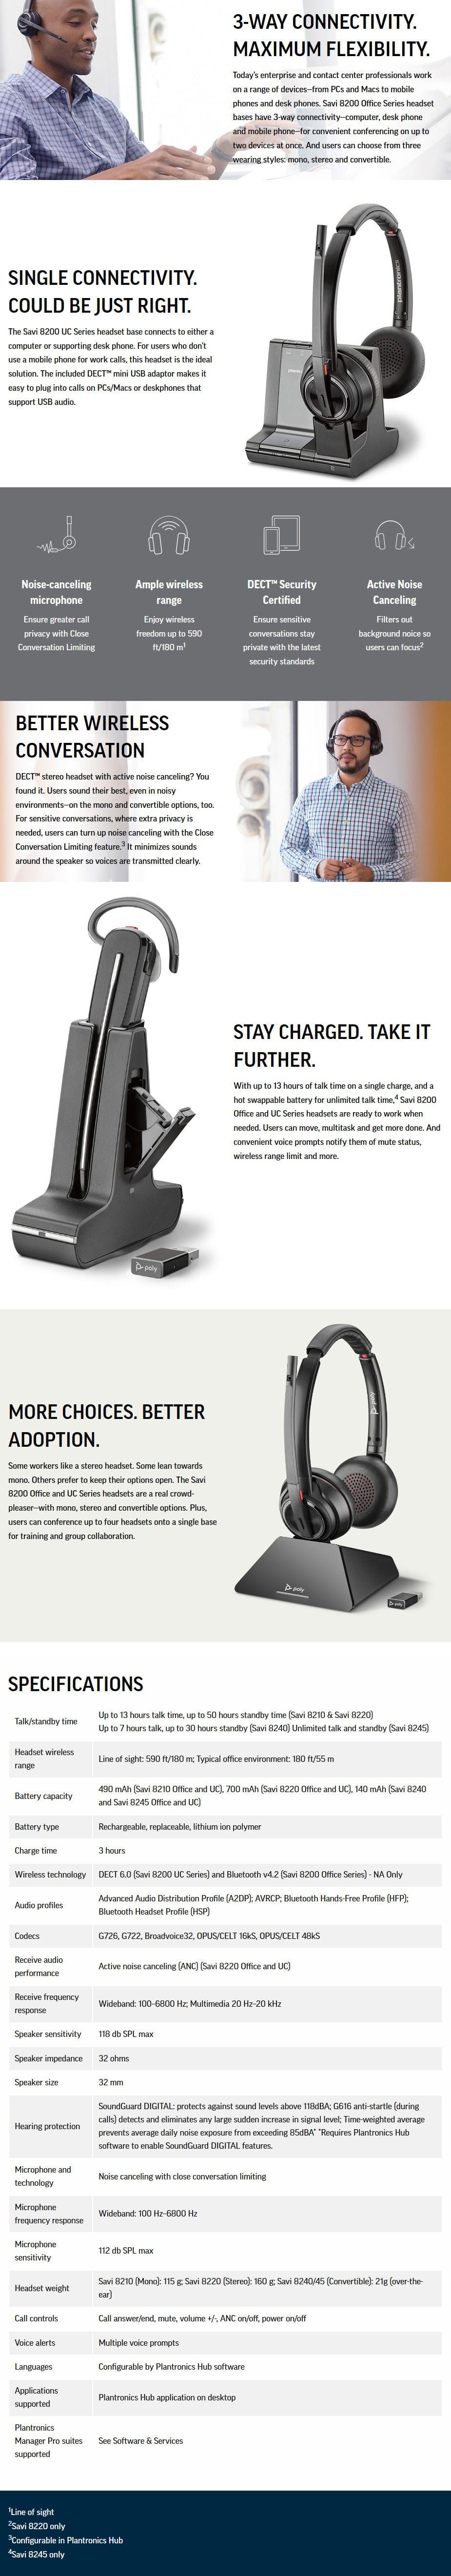 plantronics-savi-8240-uc-convertible-wireless-dect-headset-system-ac31081-1-9-.jpg